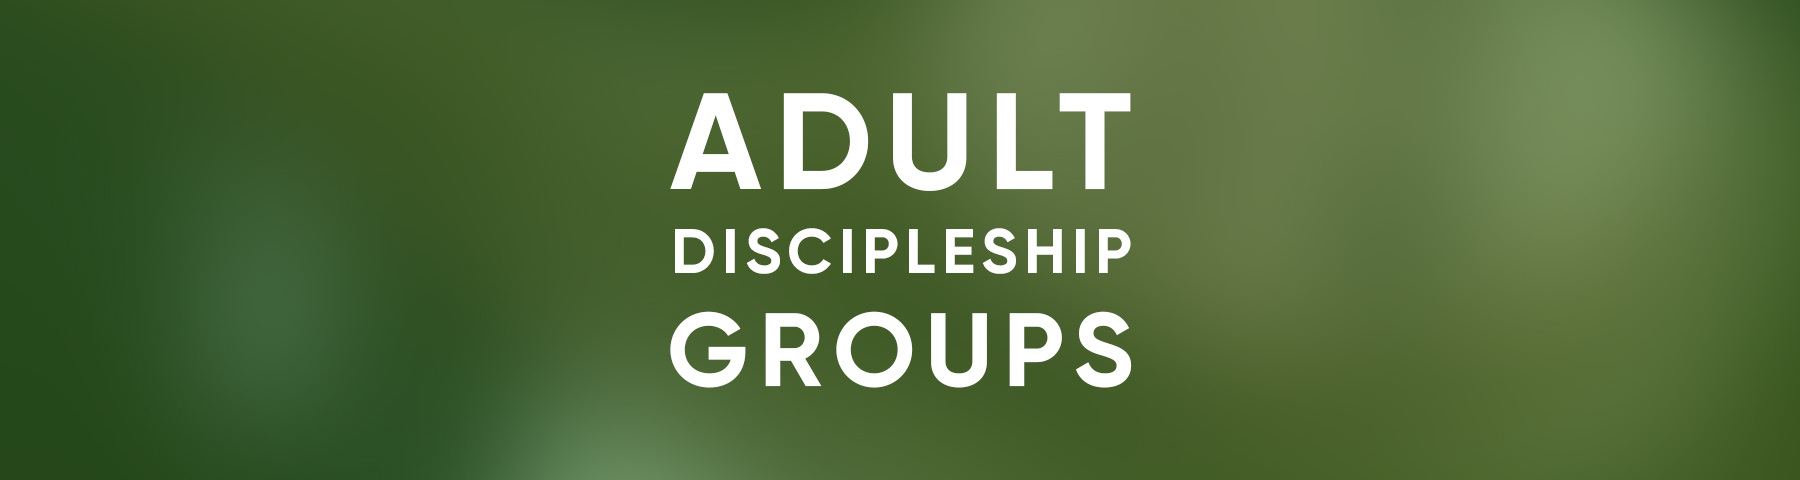 LIMACC_WEB_ADULT DISCIPLESHIP BANNER.jpg